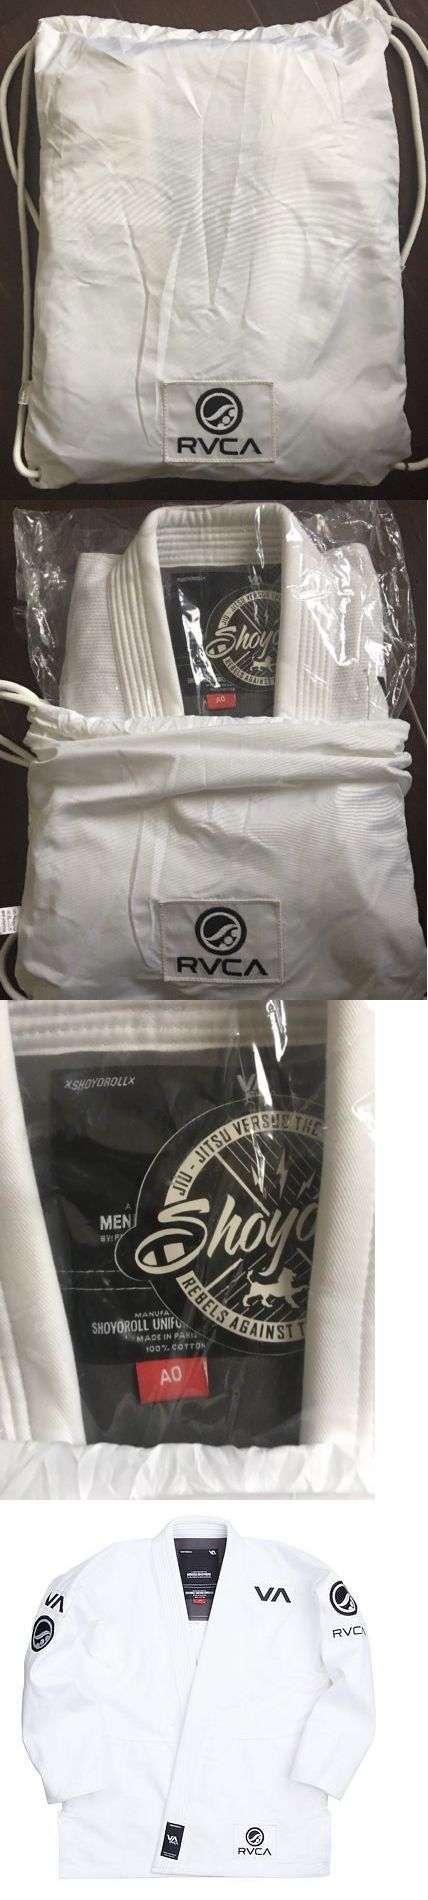 Uniforms and Gis 179774: Shoyoroll Rvca Batch #60 A0 White Bjj Kimono Bnib -> BUY IT NOW ONLY: $355 on eBay!